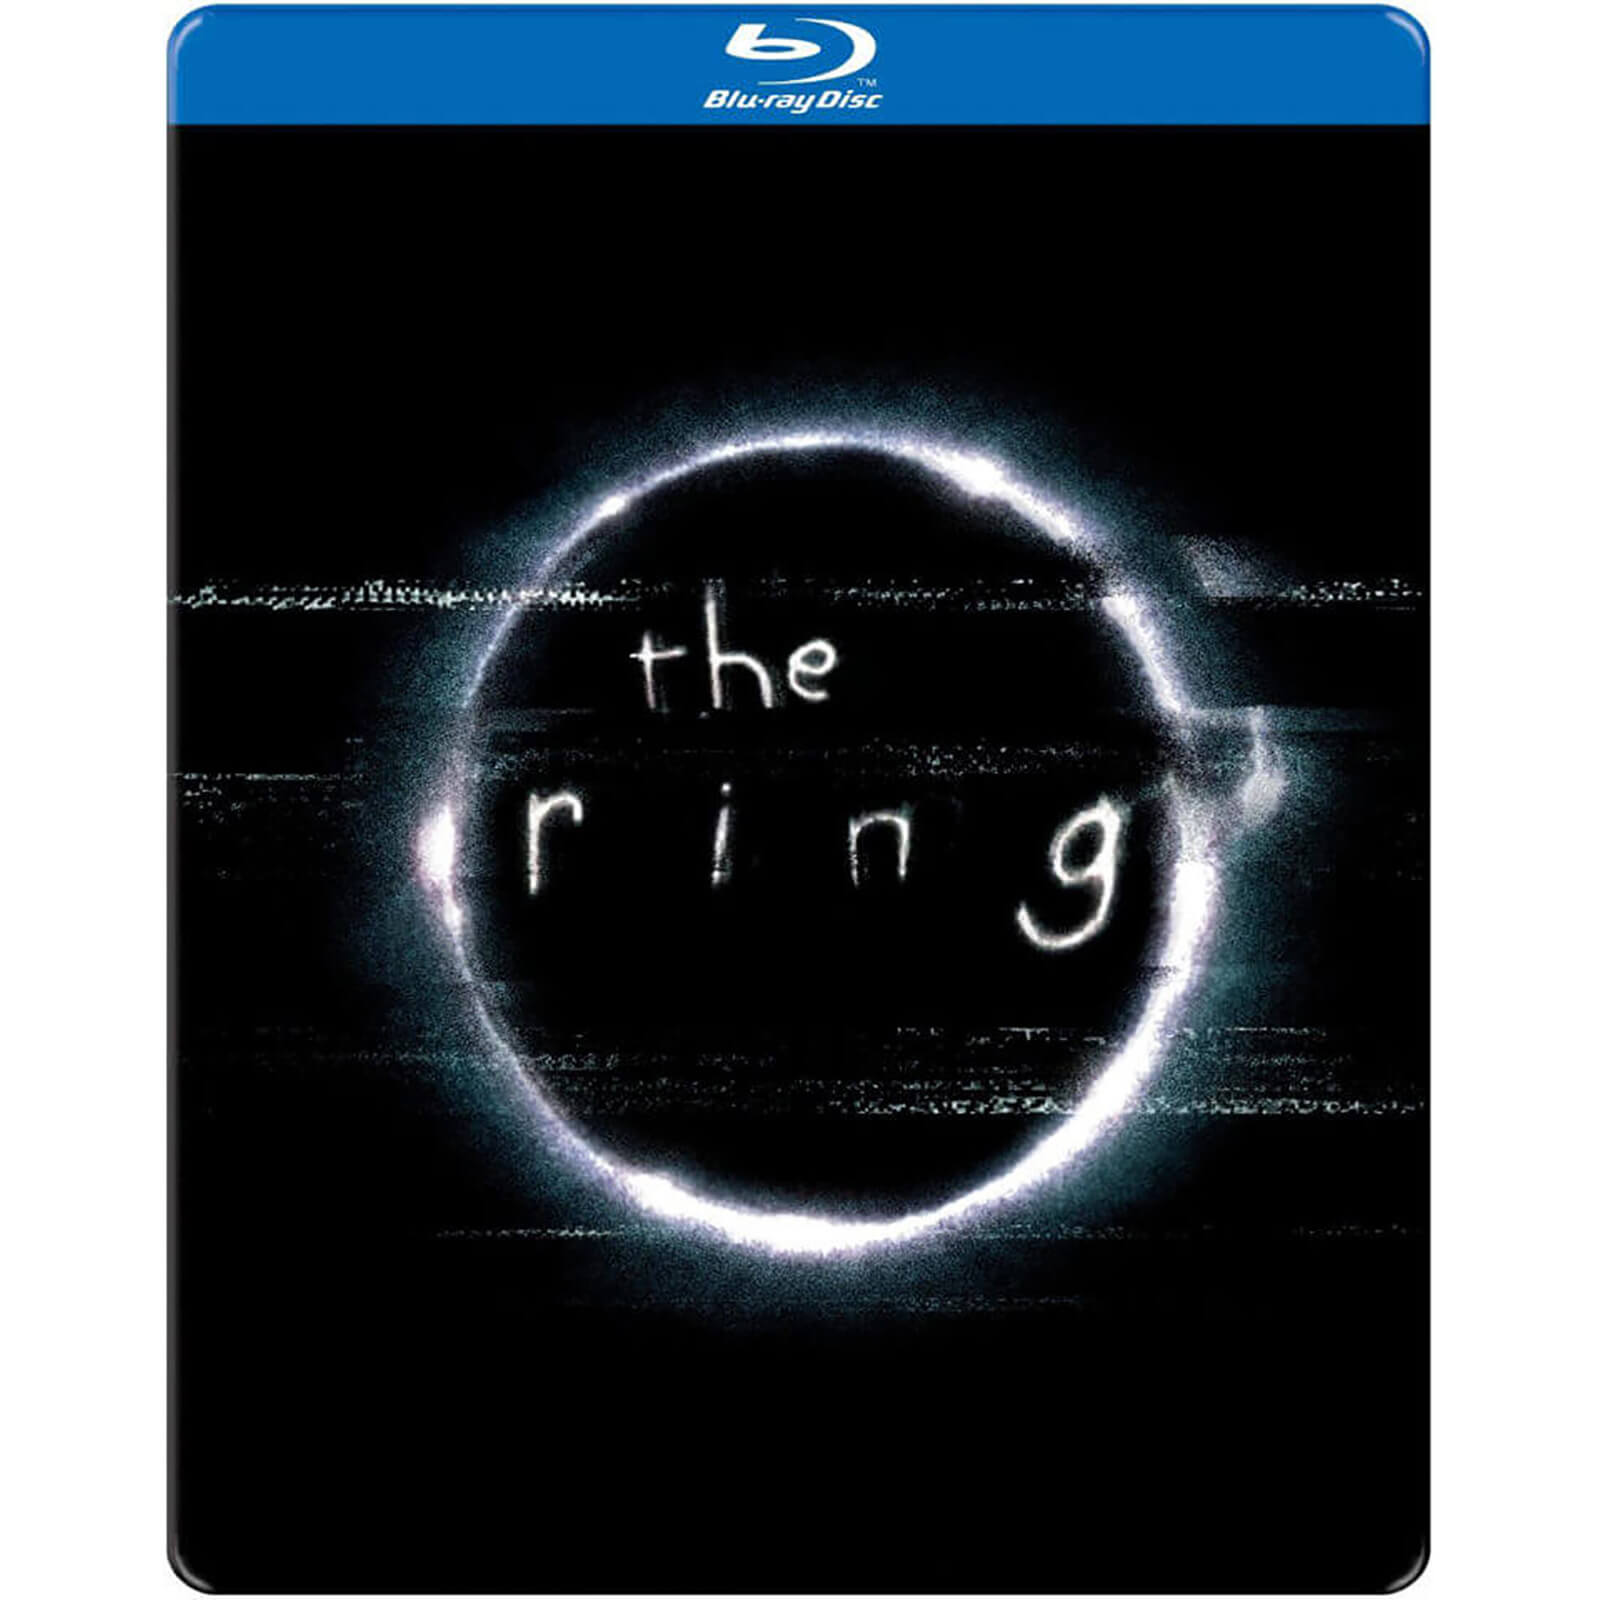 Ring / (Stbk Ac3 Dol) - Import - Limited Edition Steelbook (Region 1)